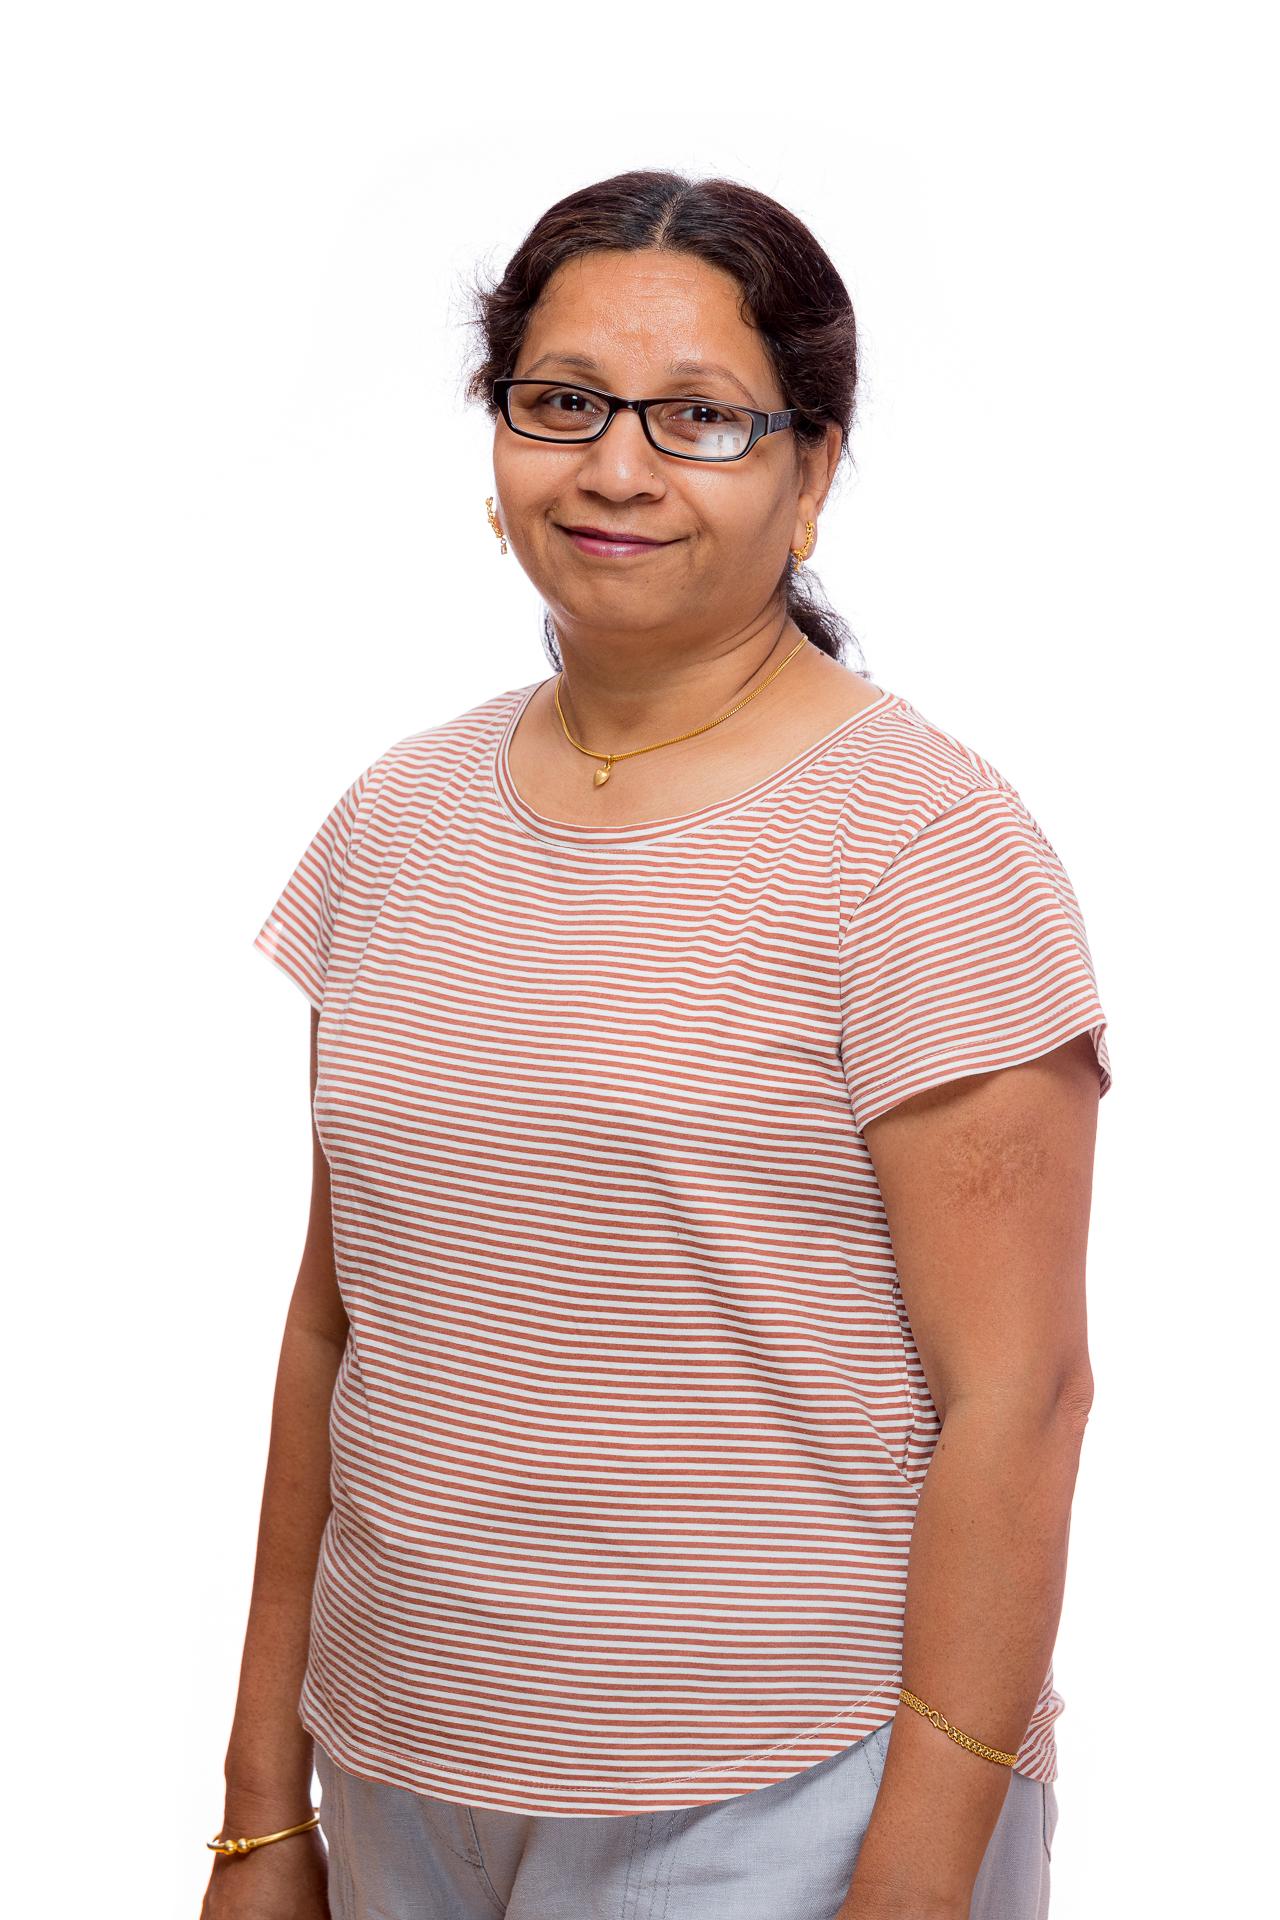 Mrs Chauhan